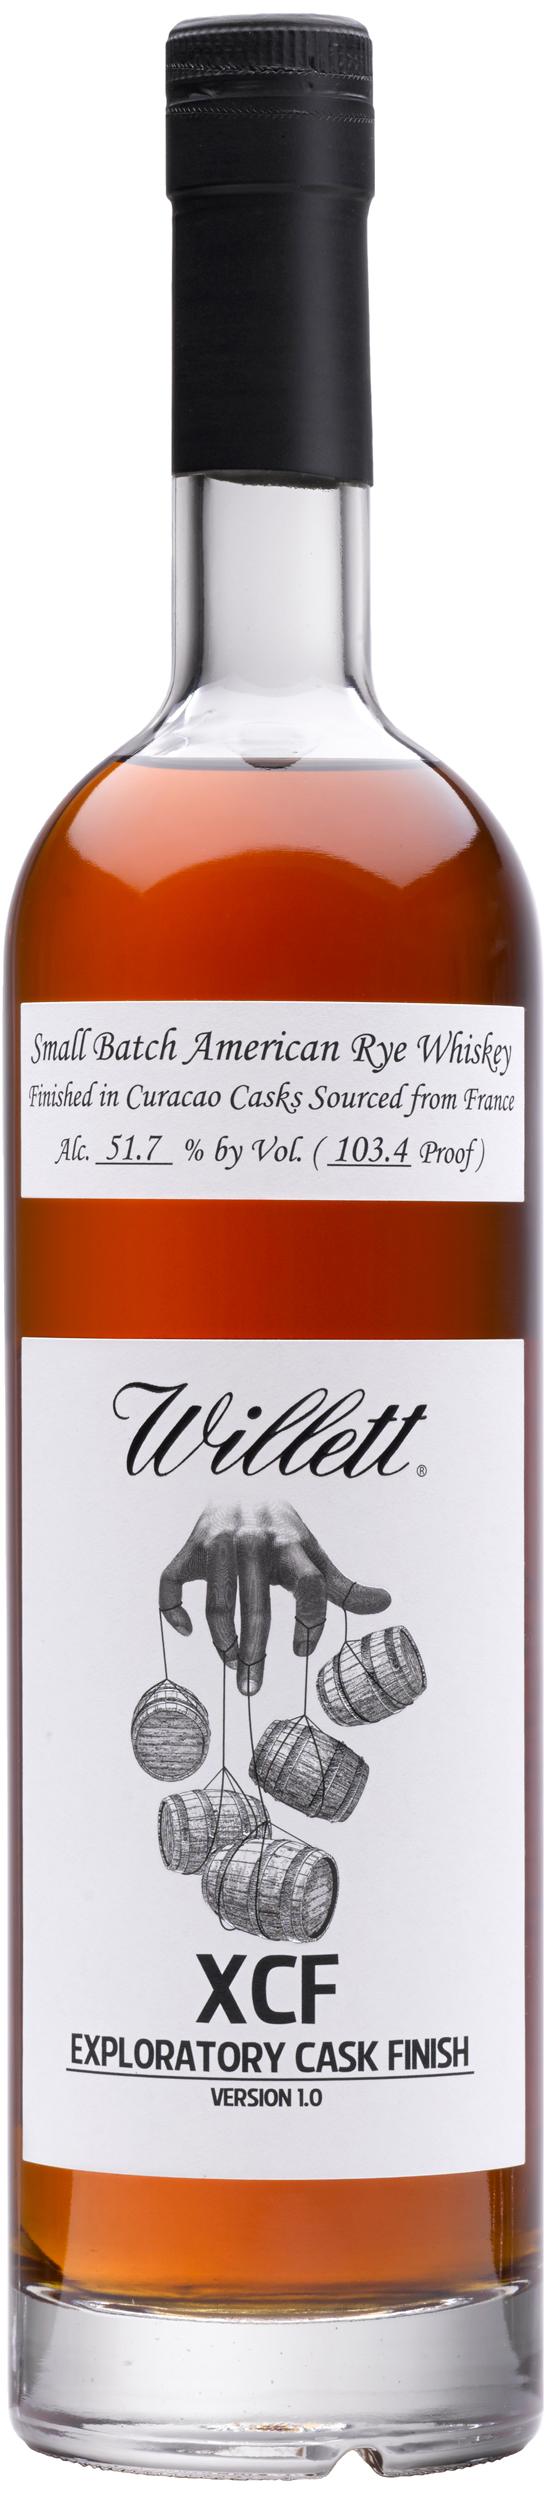 Willett Xcf Bottle Presskit Jpg 544 2500 With Images Whiskey Based Cocktails Bourbon Whiskey Whiskey